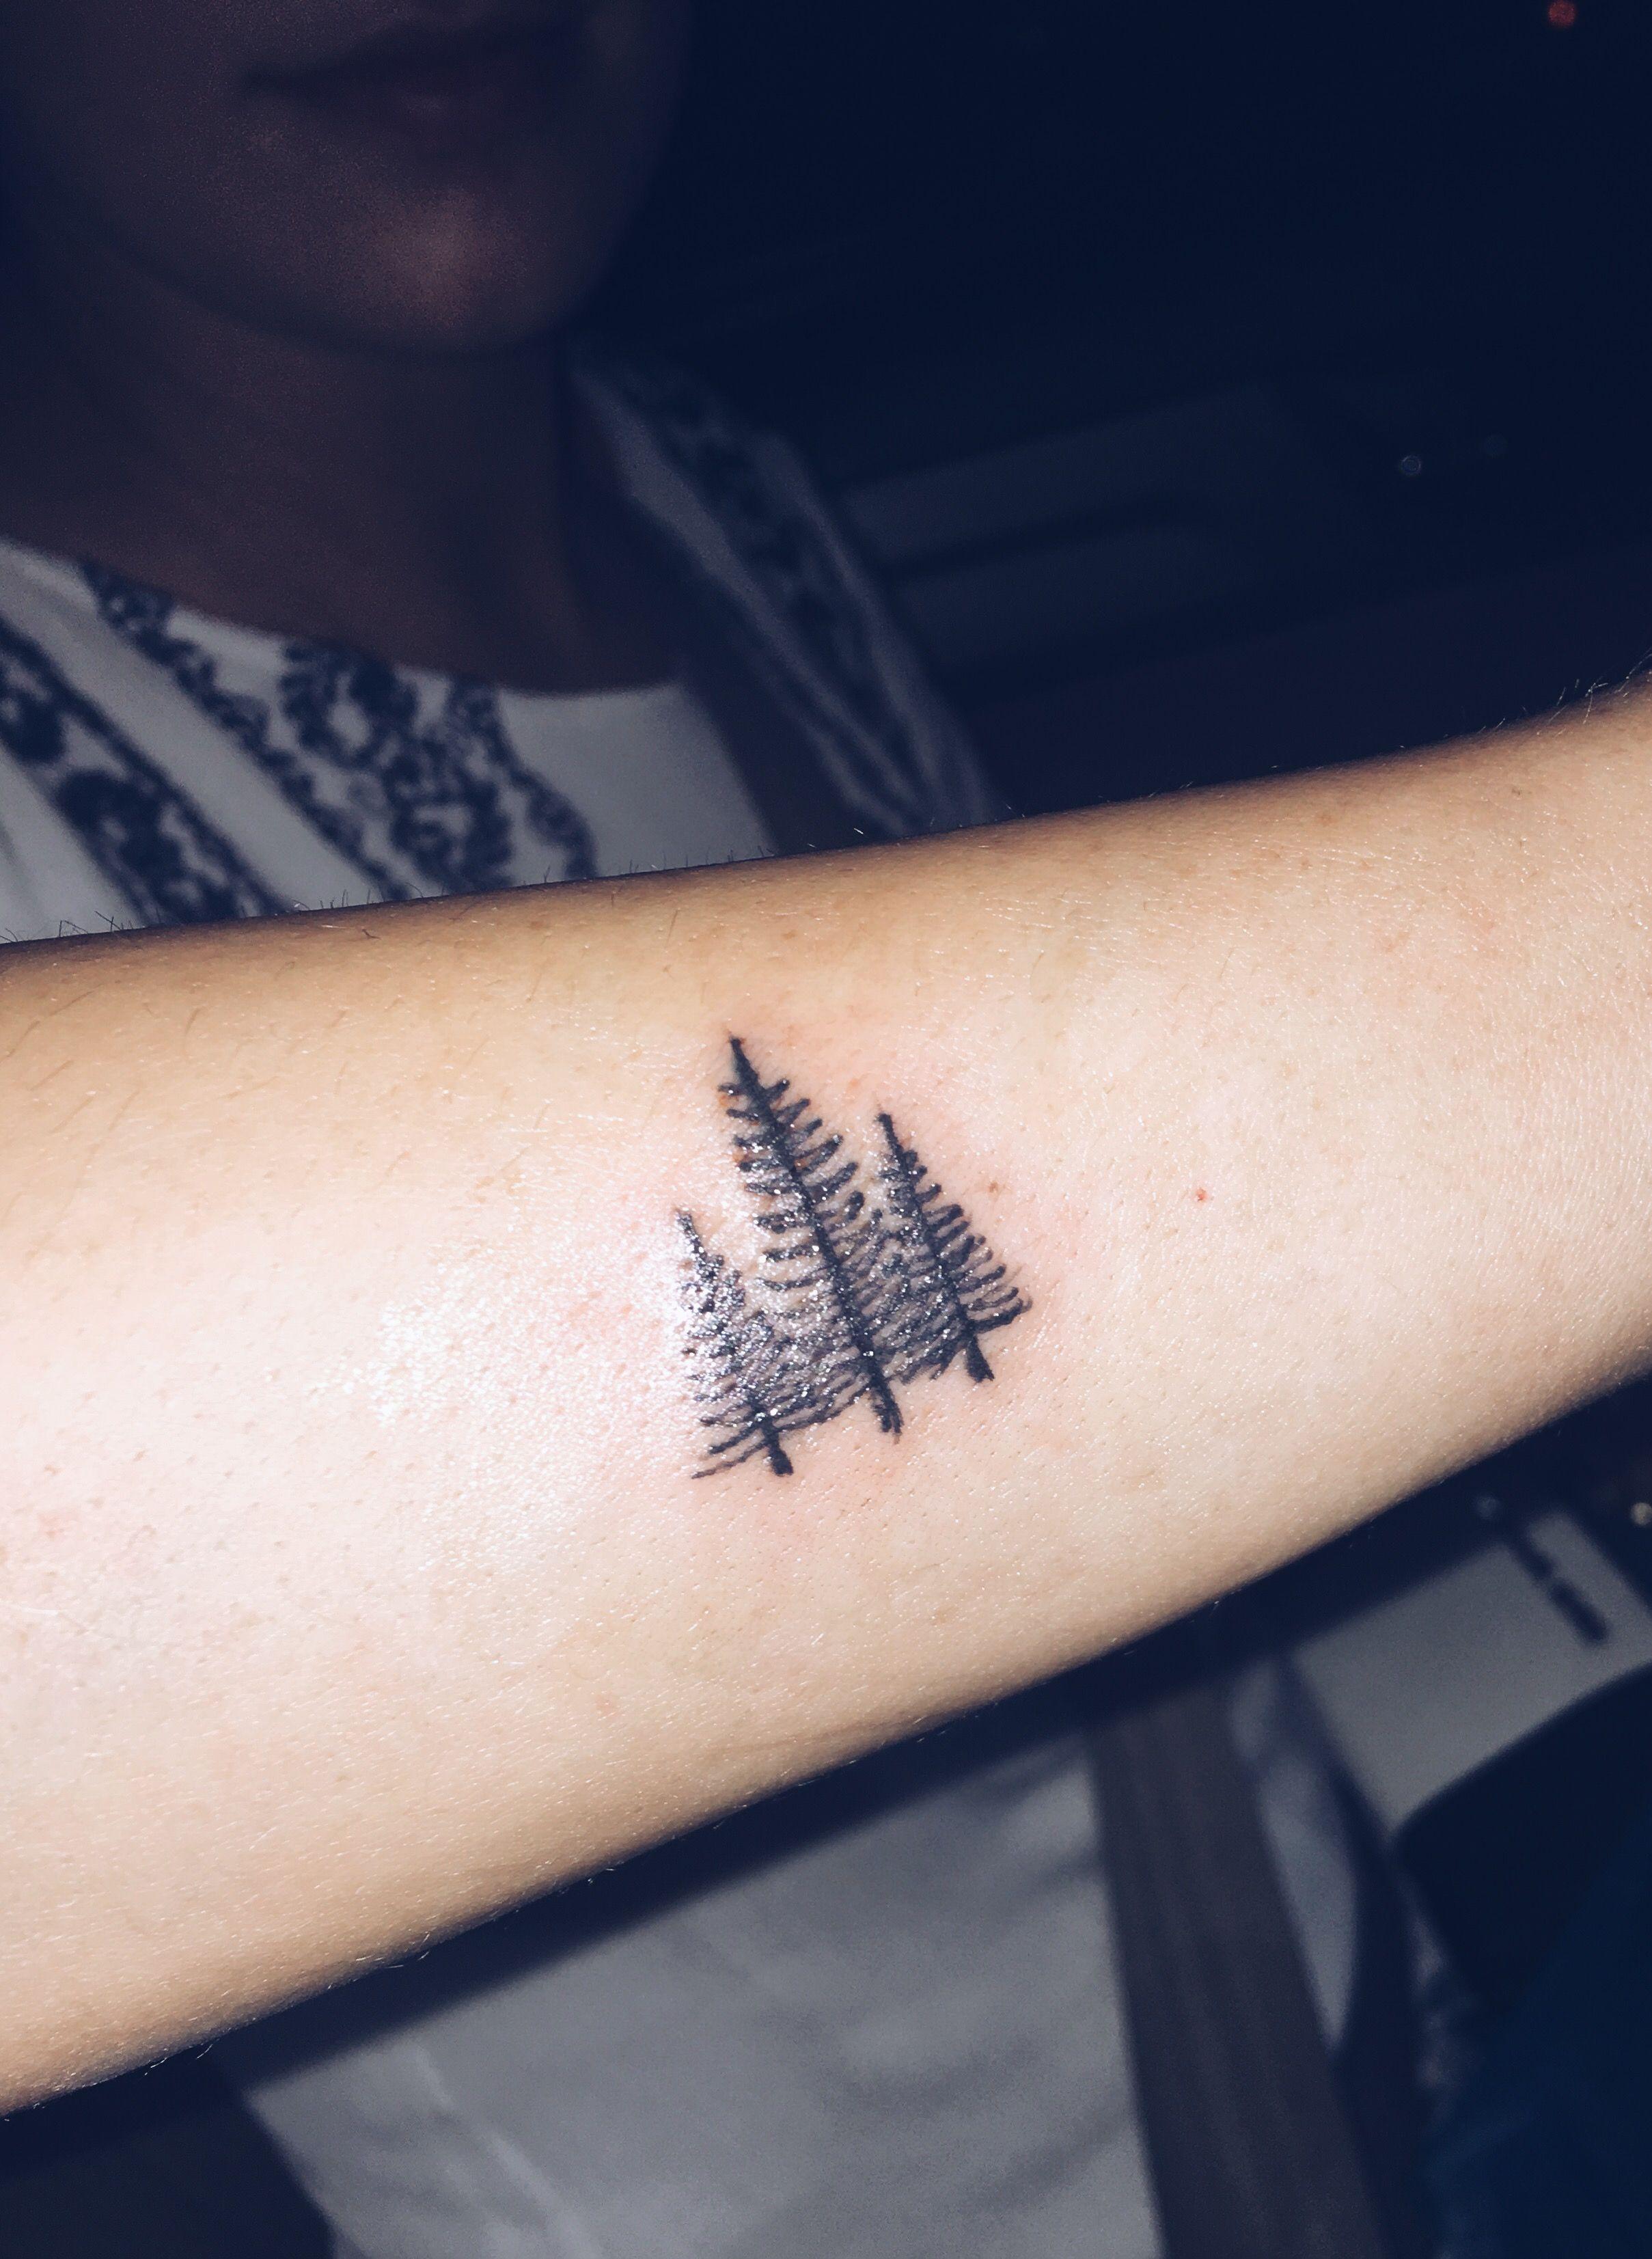 Christmas Tree Tattoo Small.Pin By Jenny On Permanent Ink Pine Tree Tattoo